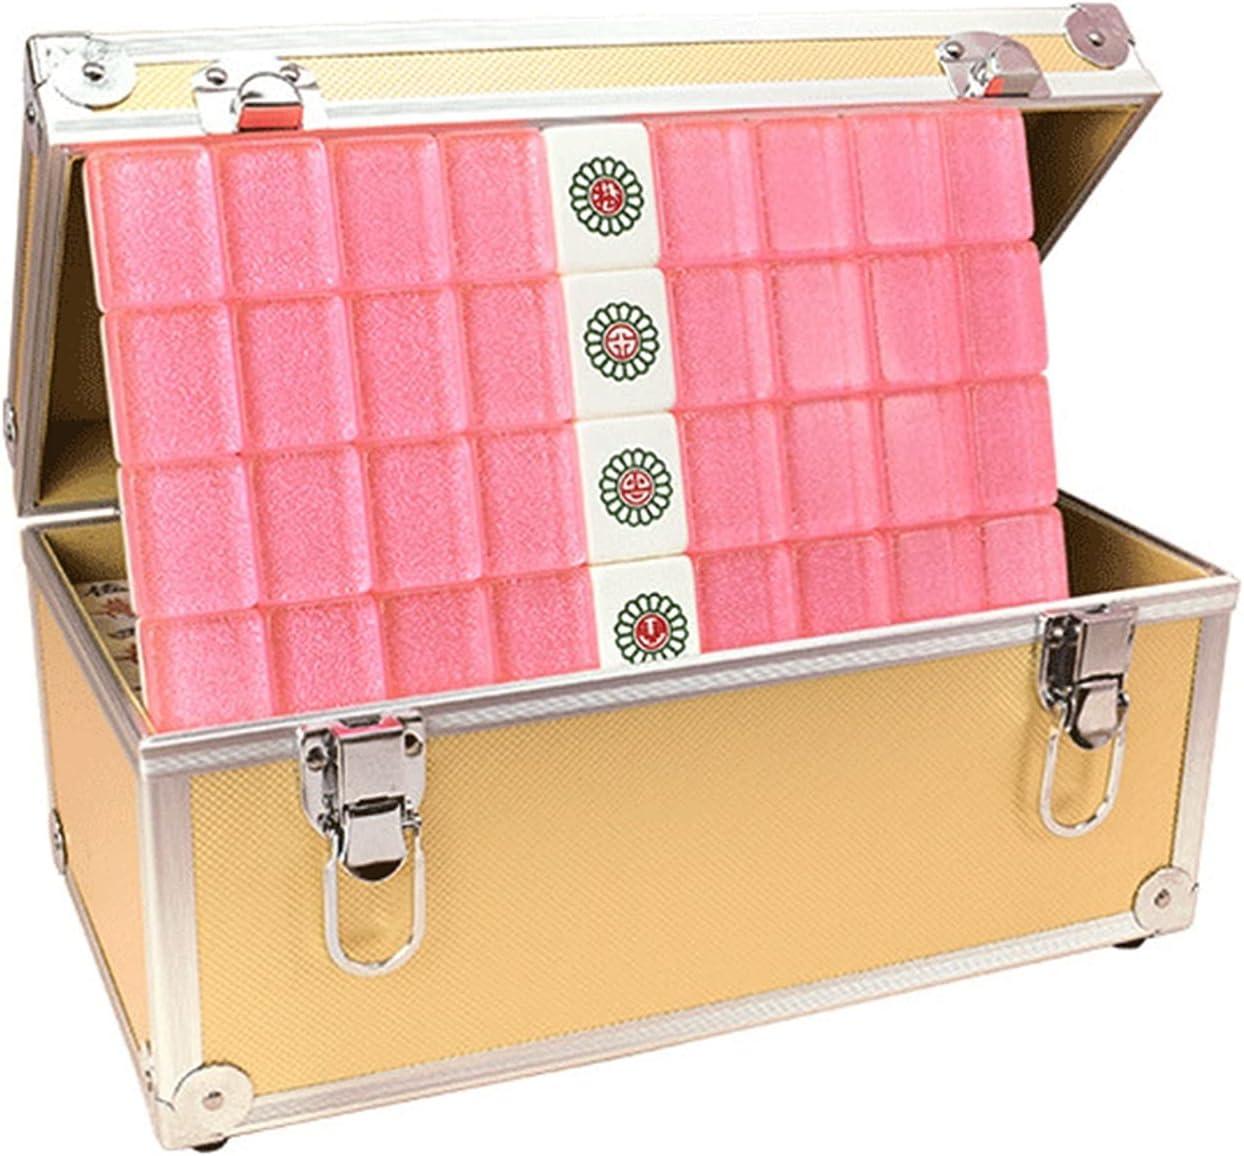 ERJIANG Newest Tile Games Mahjong Set 1 year warranty Mah 144 Japan's largest assortment Packing Box Yellow